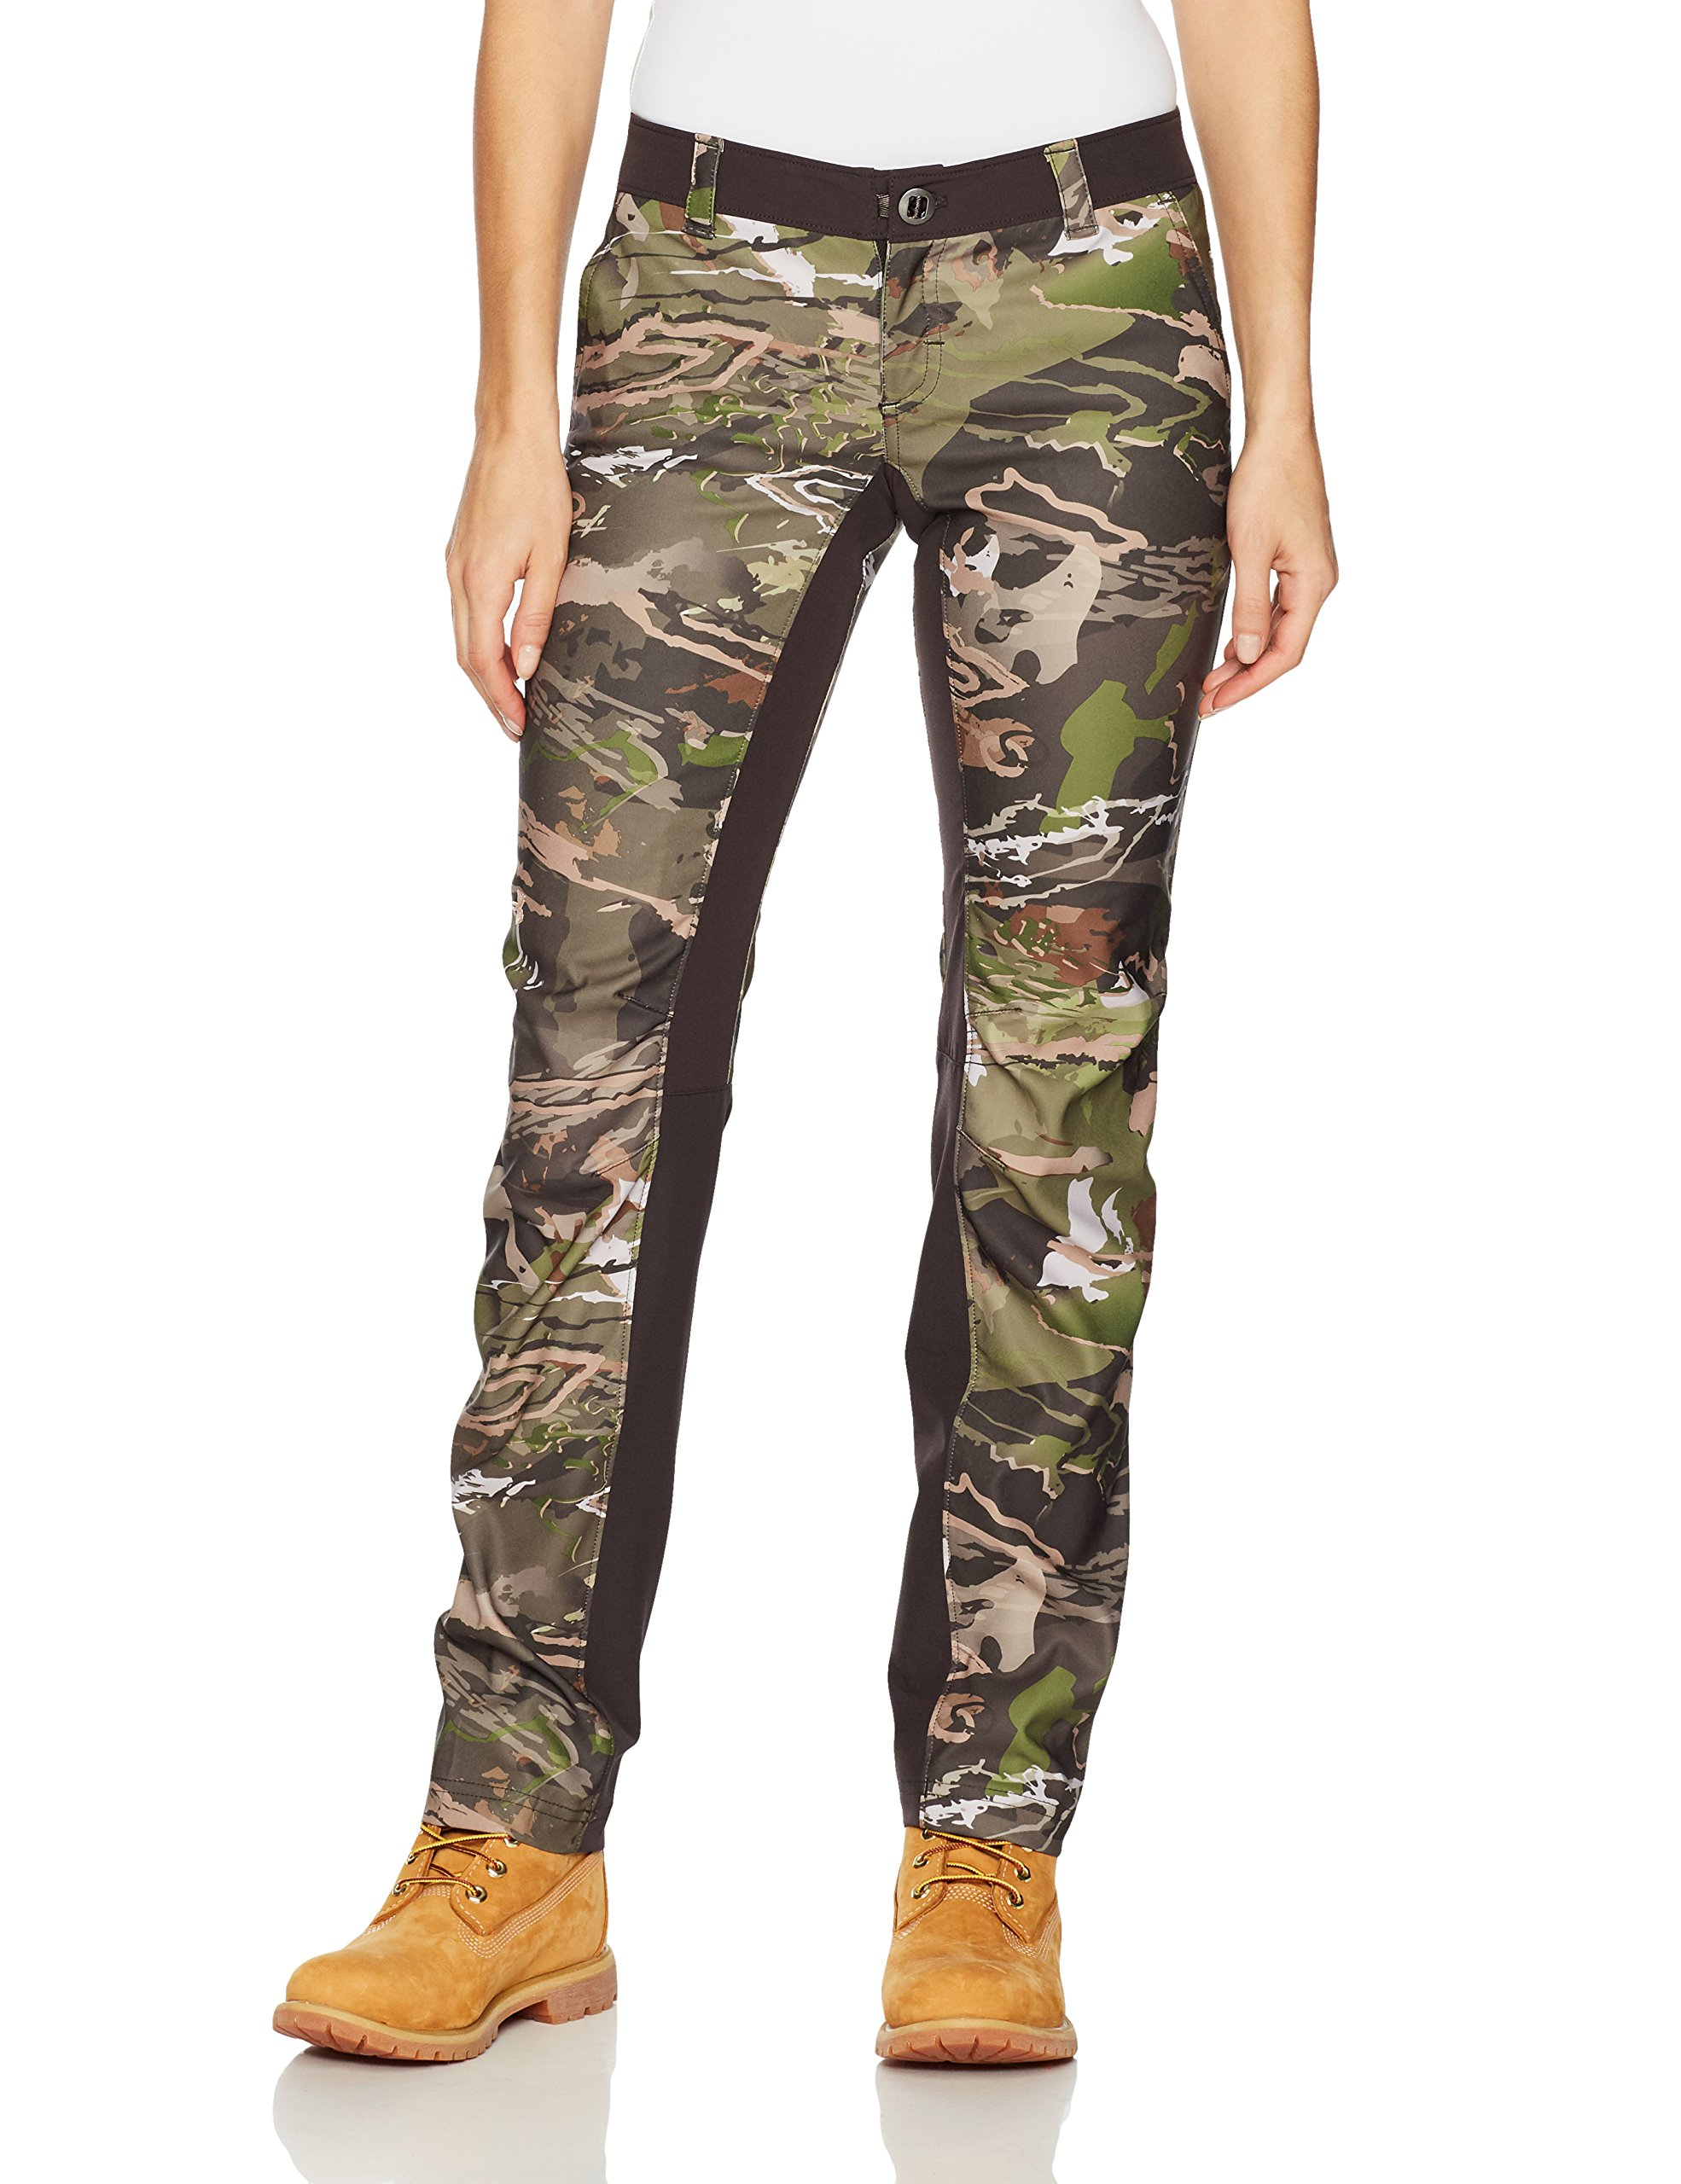 Under Armour Women's Fletching Pant,Ridge Reaper Camo Fo /Metallic Beige, 8 by Under Armour